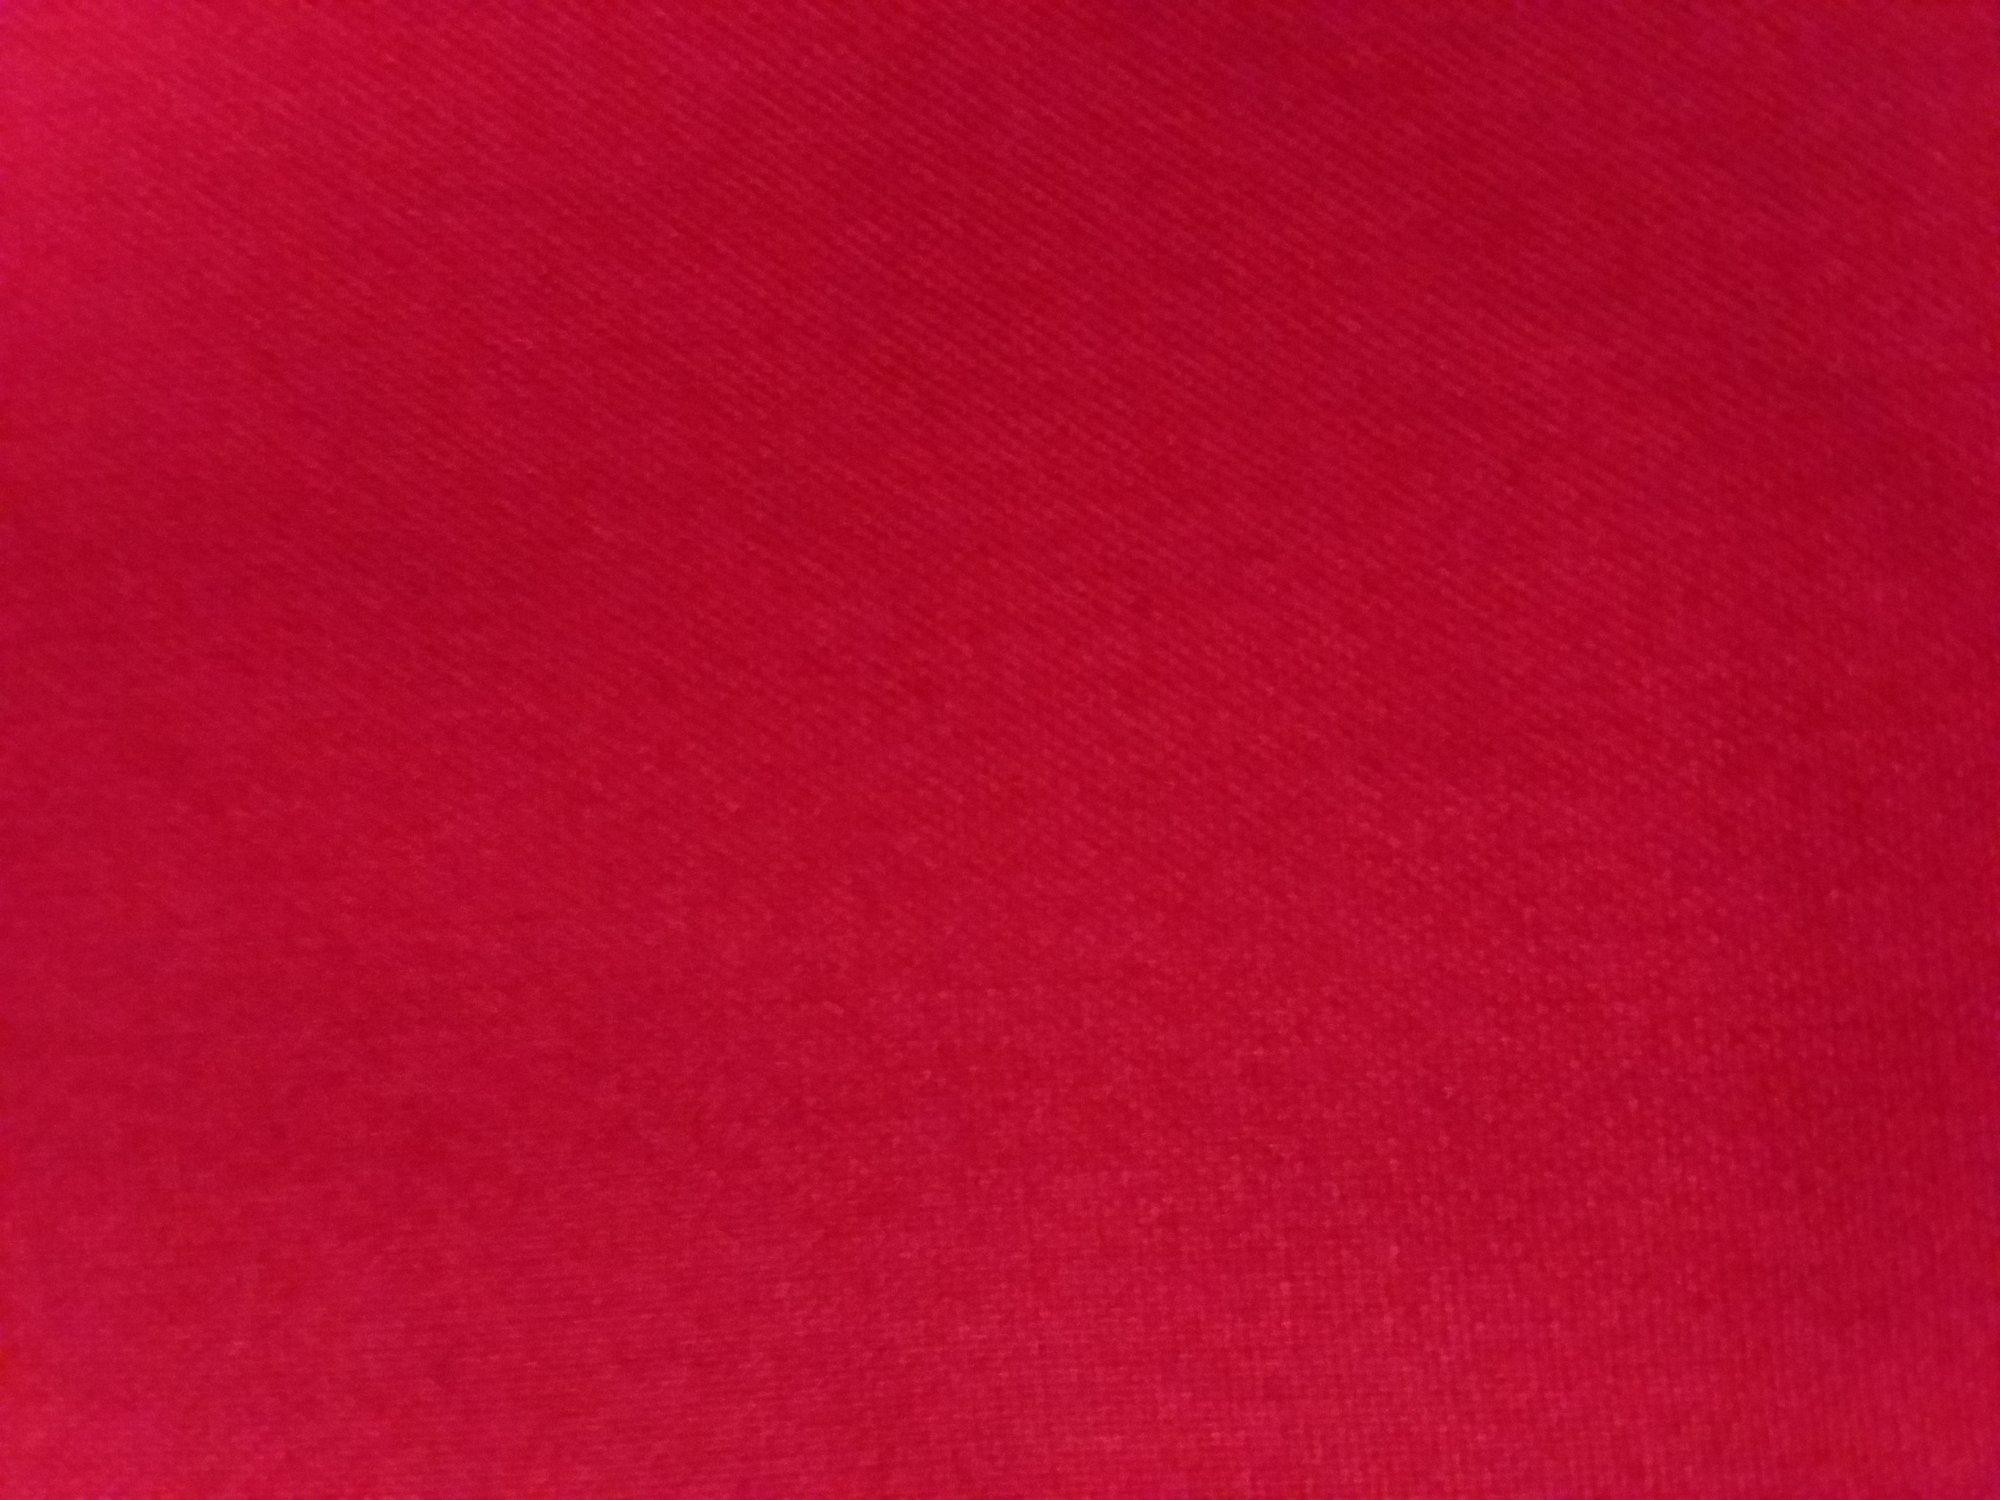 OA622064-53 Classic Red